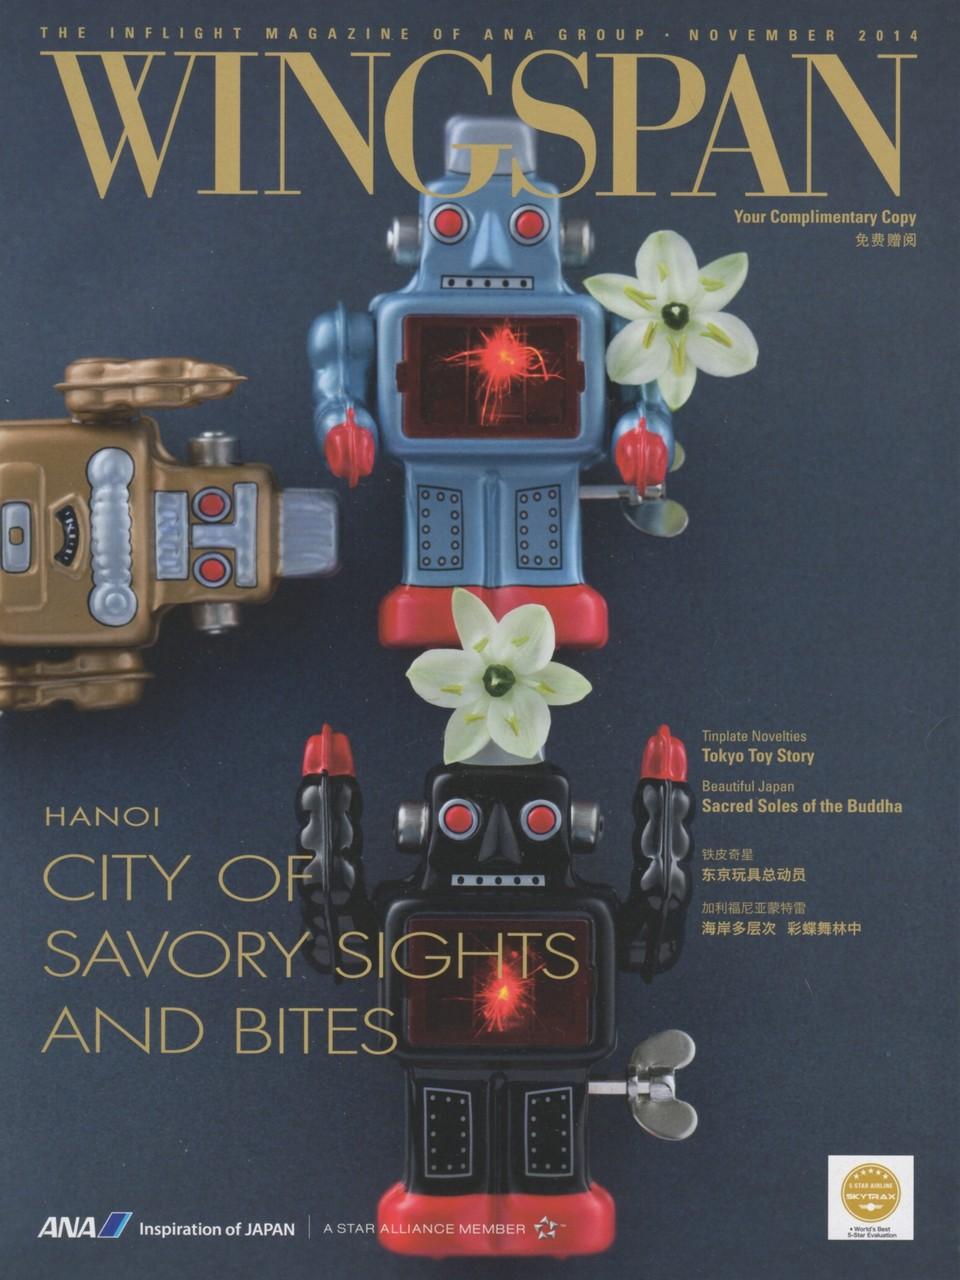 WINGSPAN / ANA  photo) Yoneo Kawabe AD)  Katsunori Arai / OLTRE design) Yukimi Hatori / I&I   https://www.ana.co.jp/mediastation/wingspan/1510/